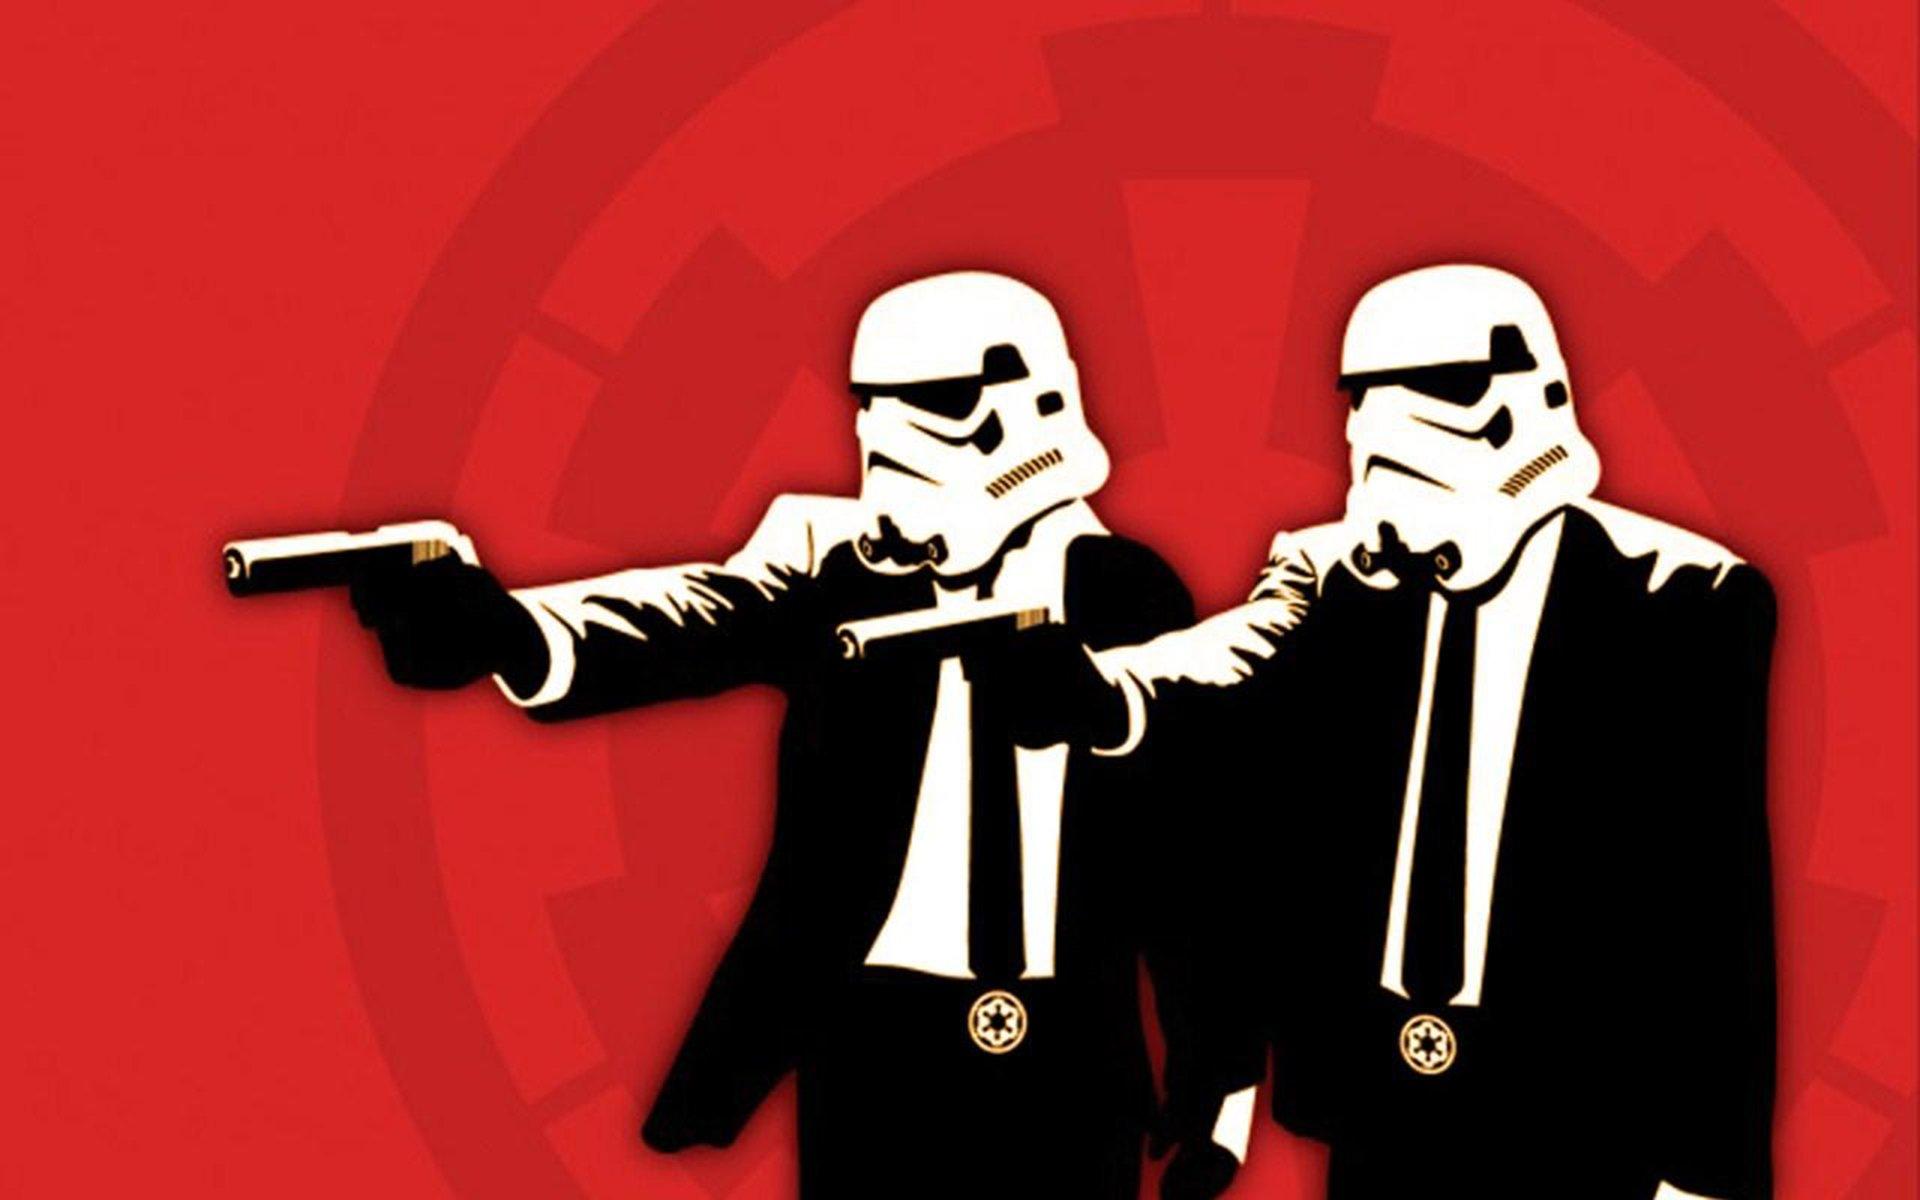 Red stormtroopers pulp fiction wallpaper 1920x1200 - Stormtrooper suit wallpaper ...